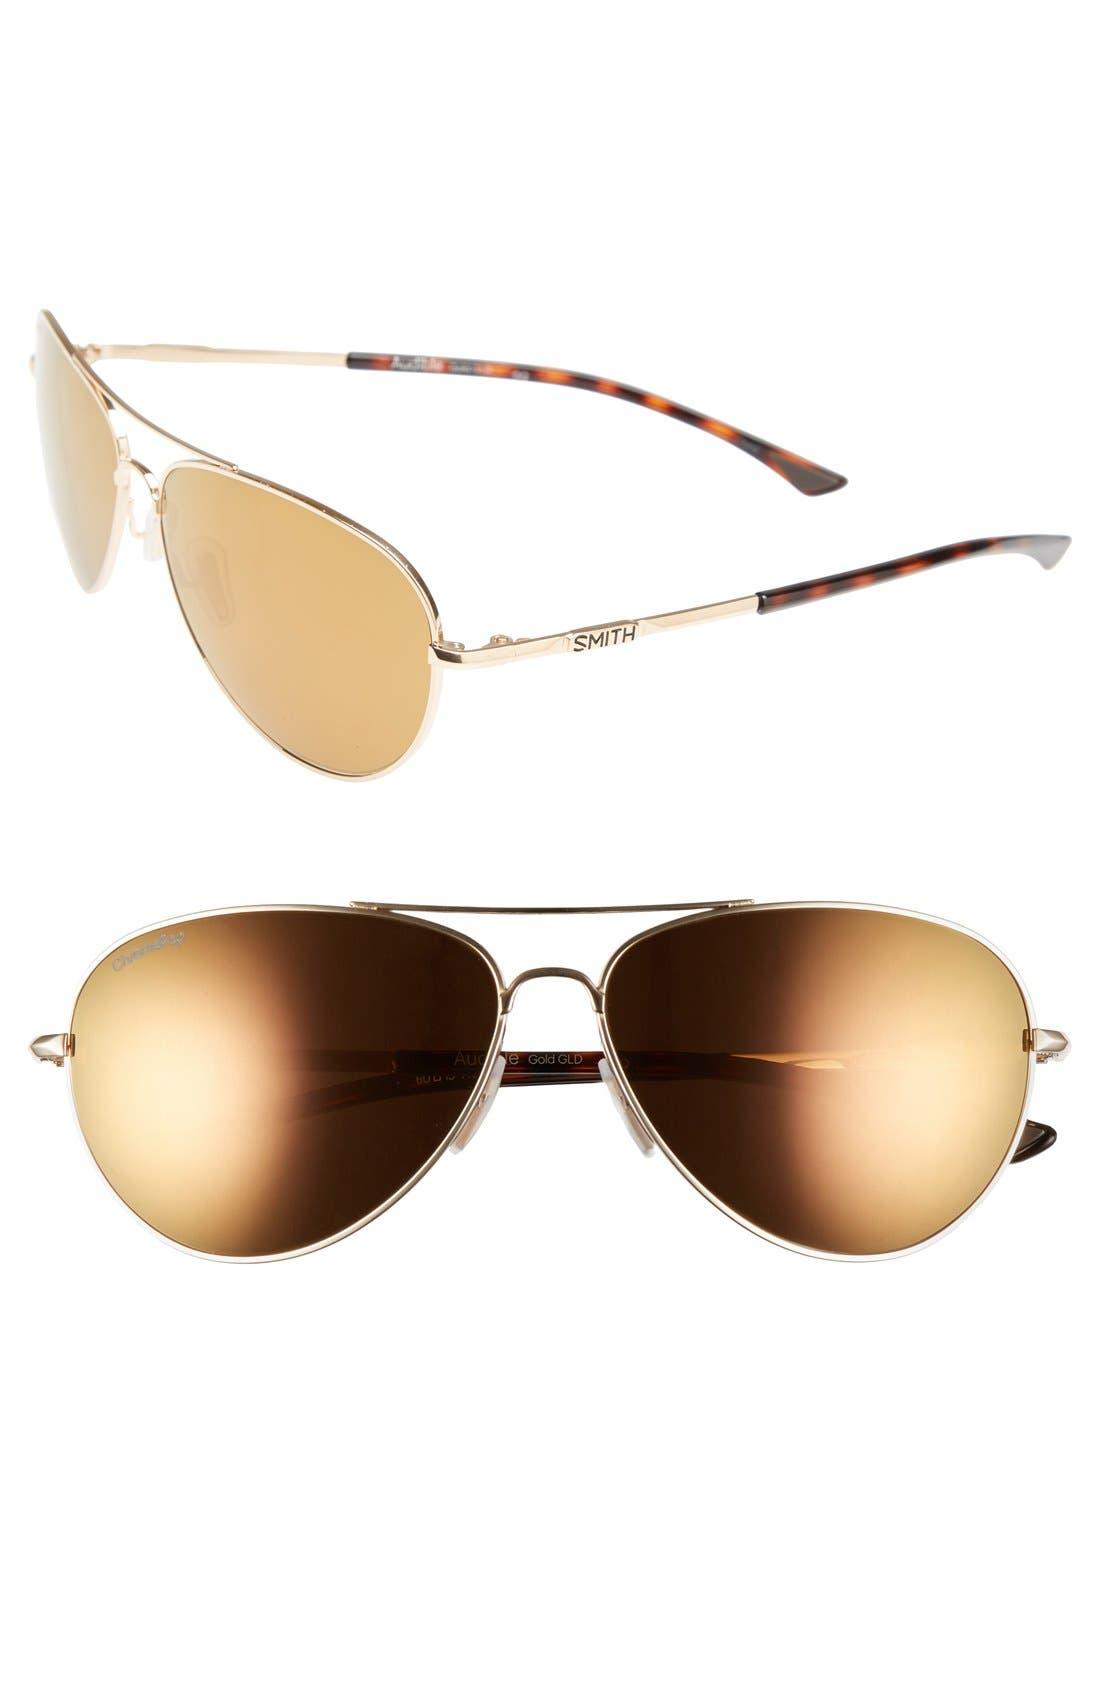 'Audible - ChromaPop' 60mm Polarized Aviator Sunglasses,                         Main,                         color, Gold/ Polar Bronze Mirror